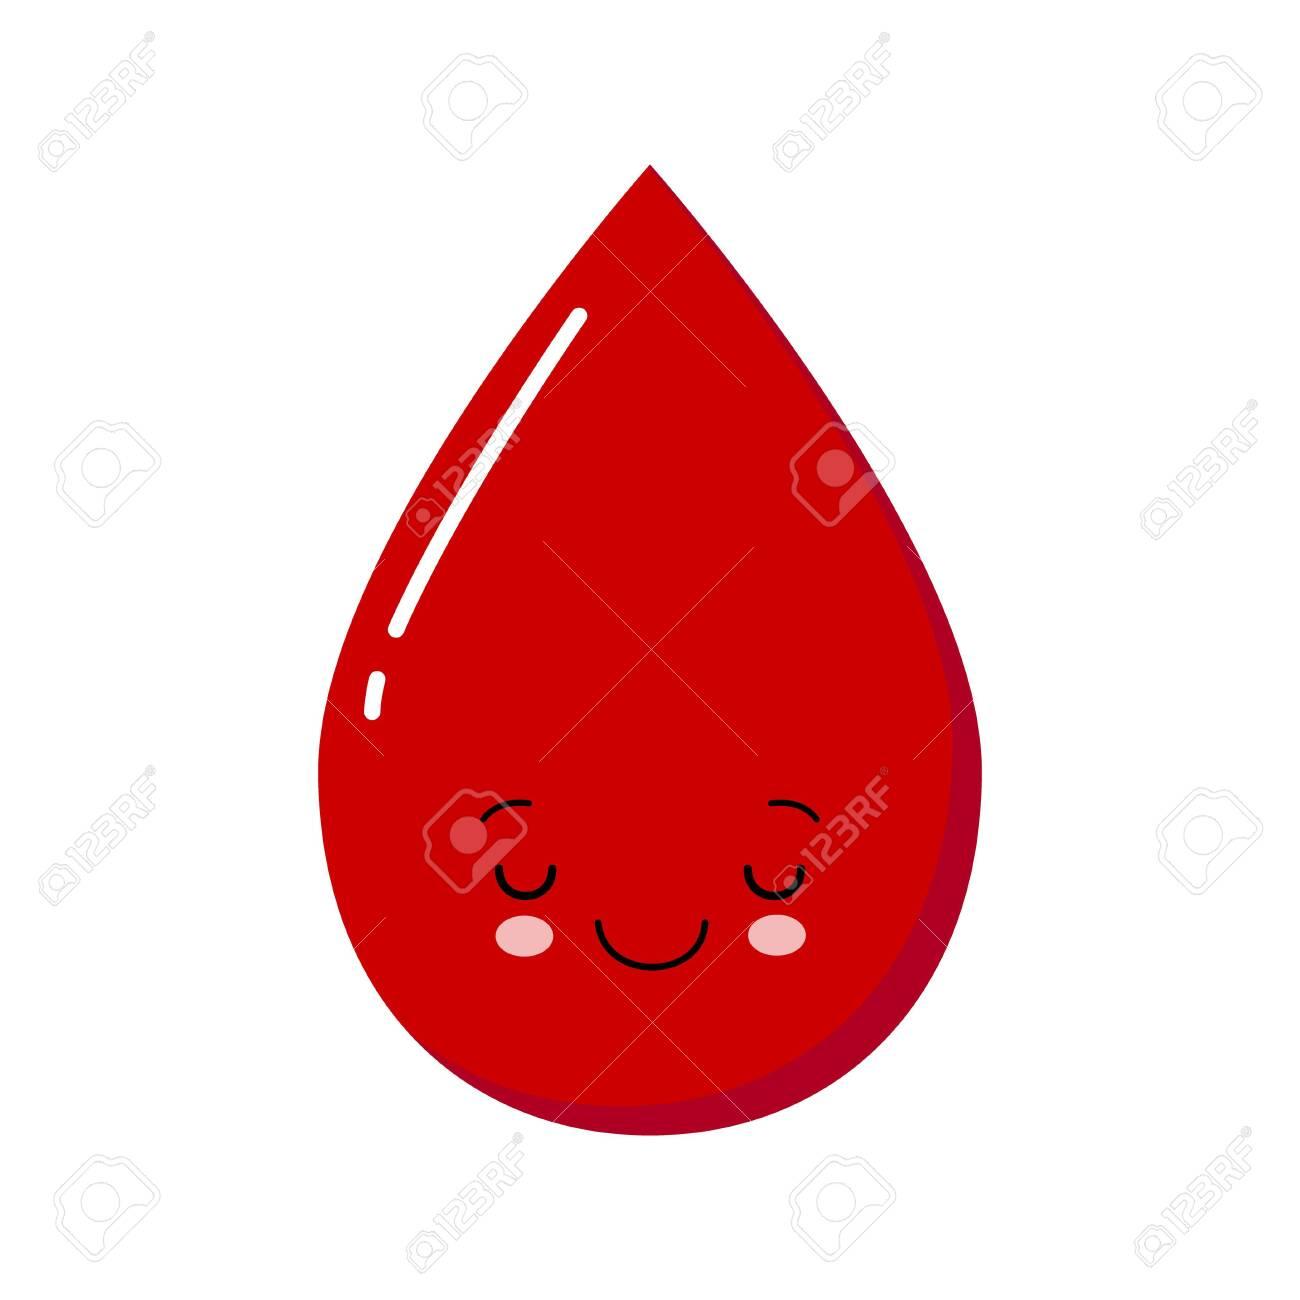 Cute Cartoon Blood Drop Character Medical Vector Illustration Royalty Free Cliparts Vectors And Stock Illustration Image 132512161